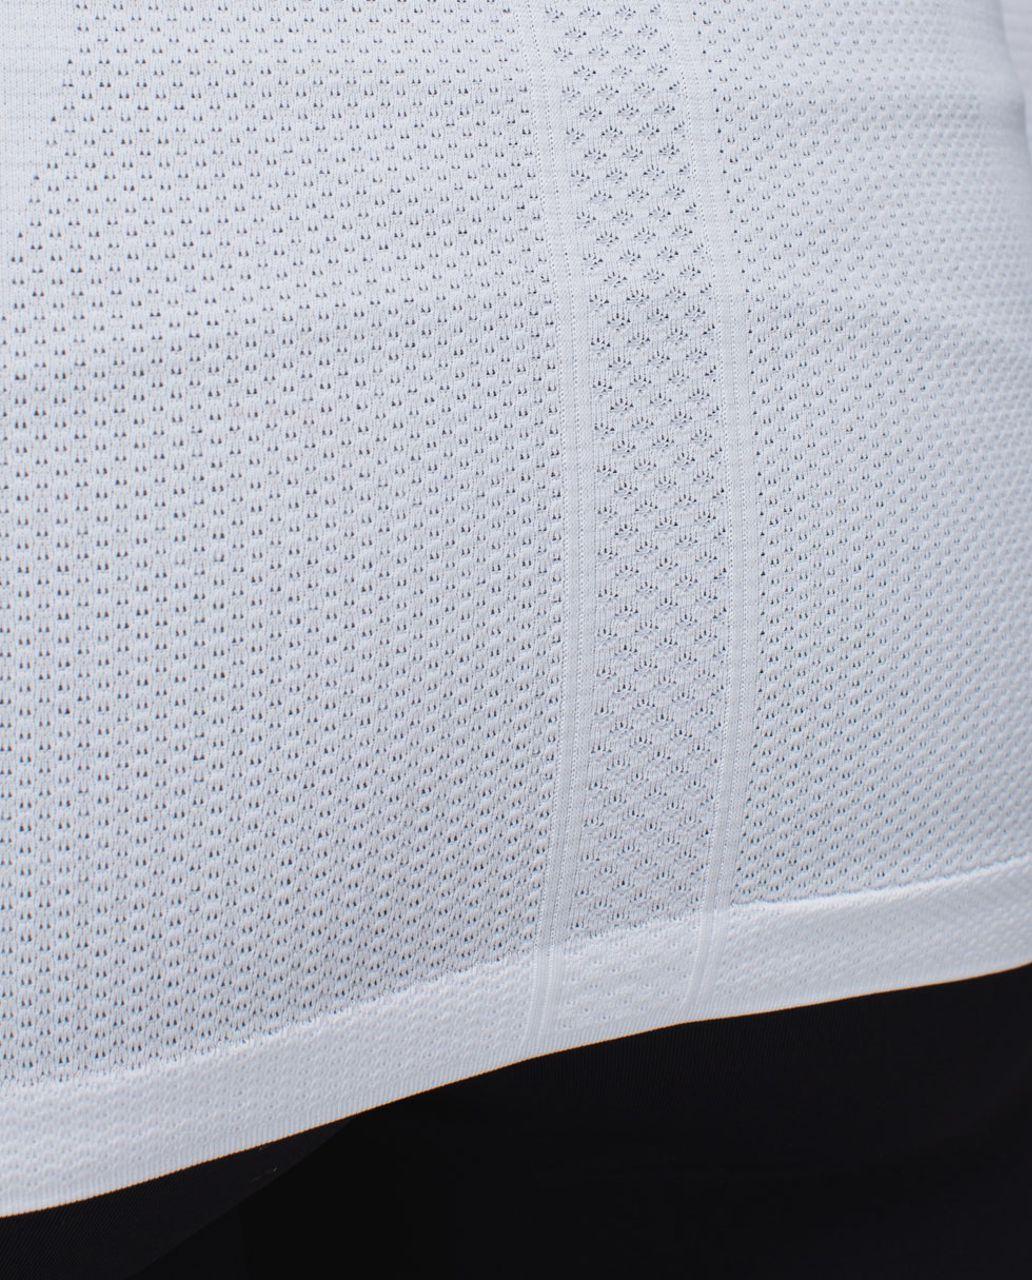 Lululemon Swiftly Tech Long Sleeve - White